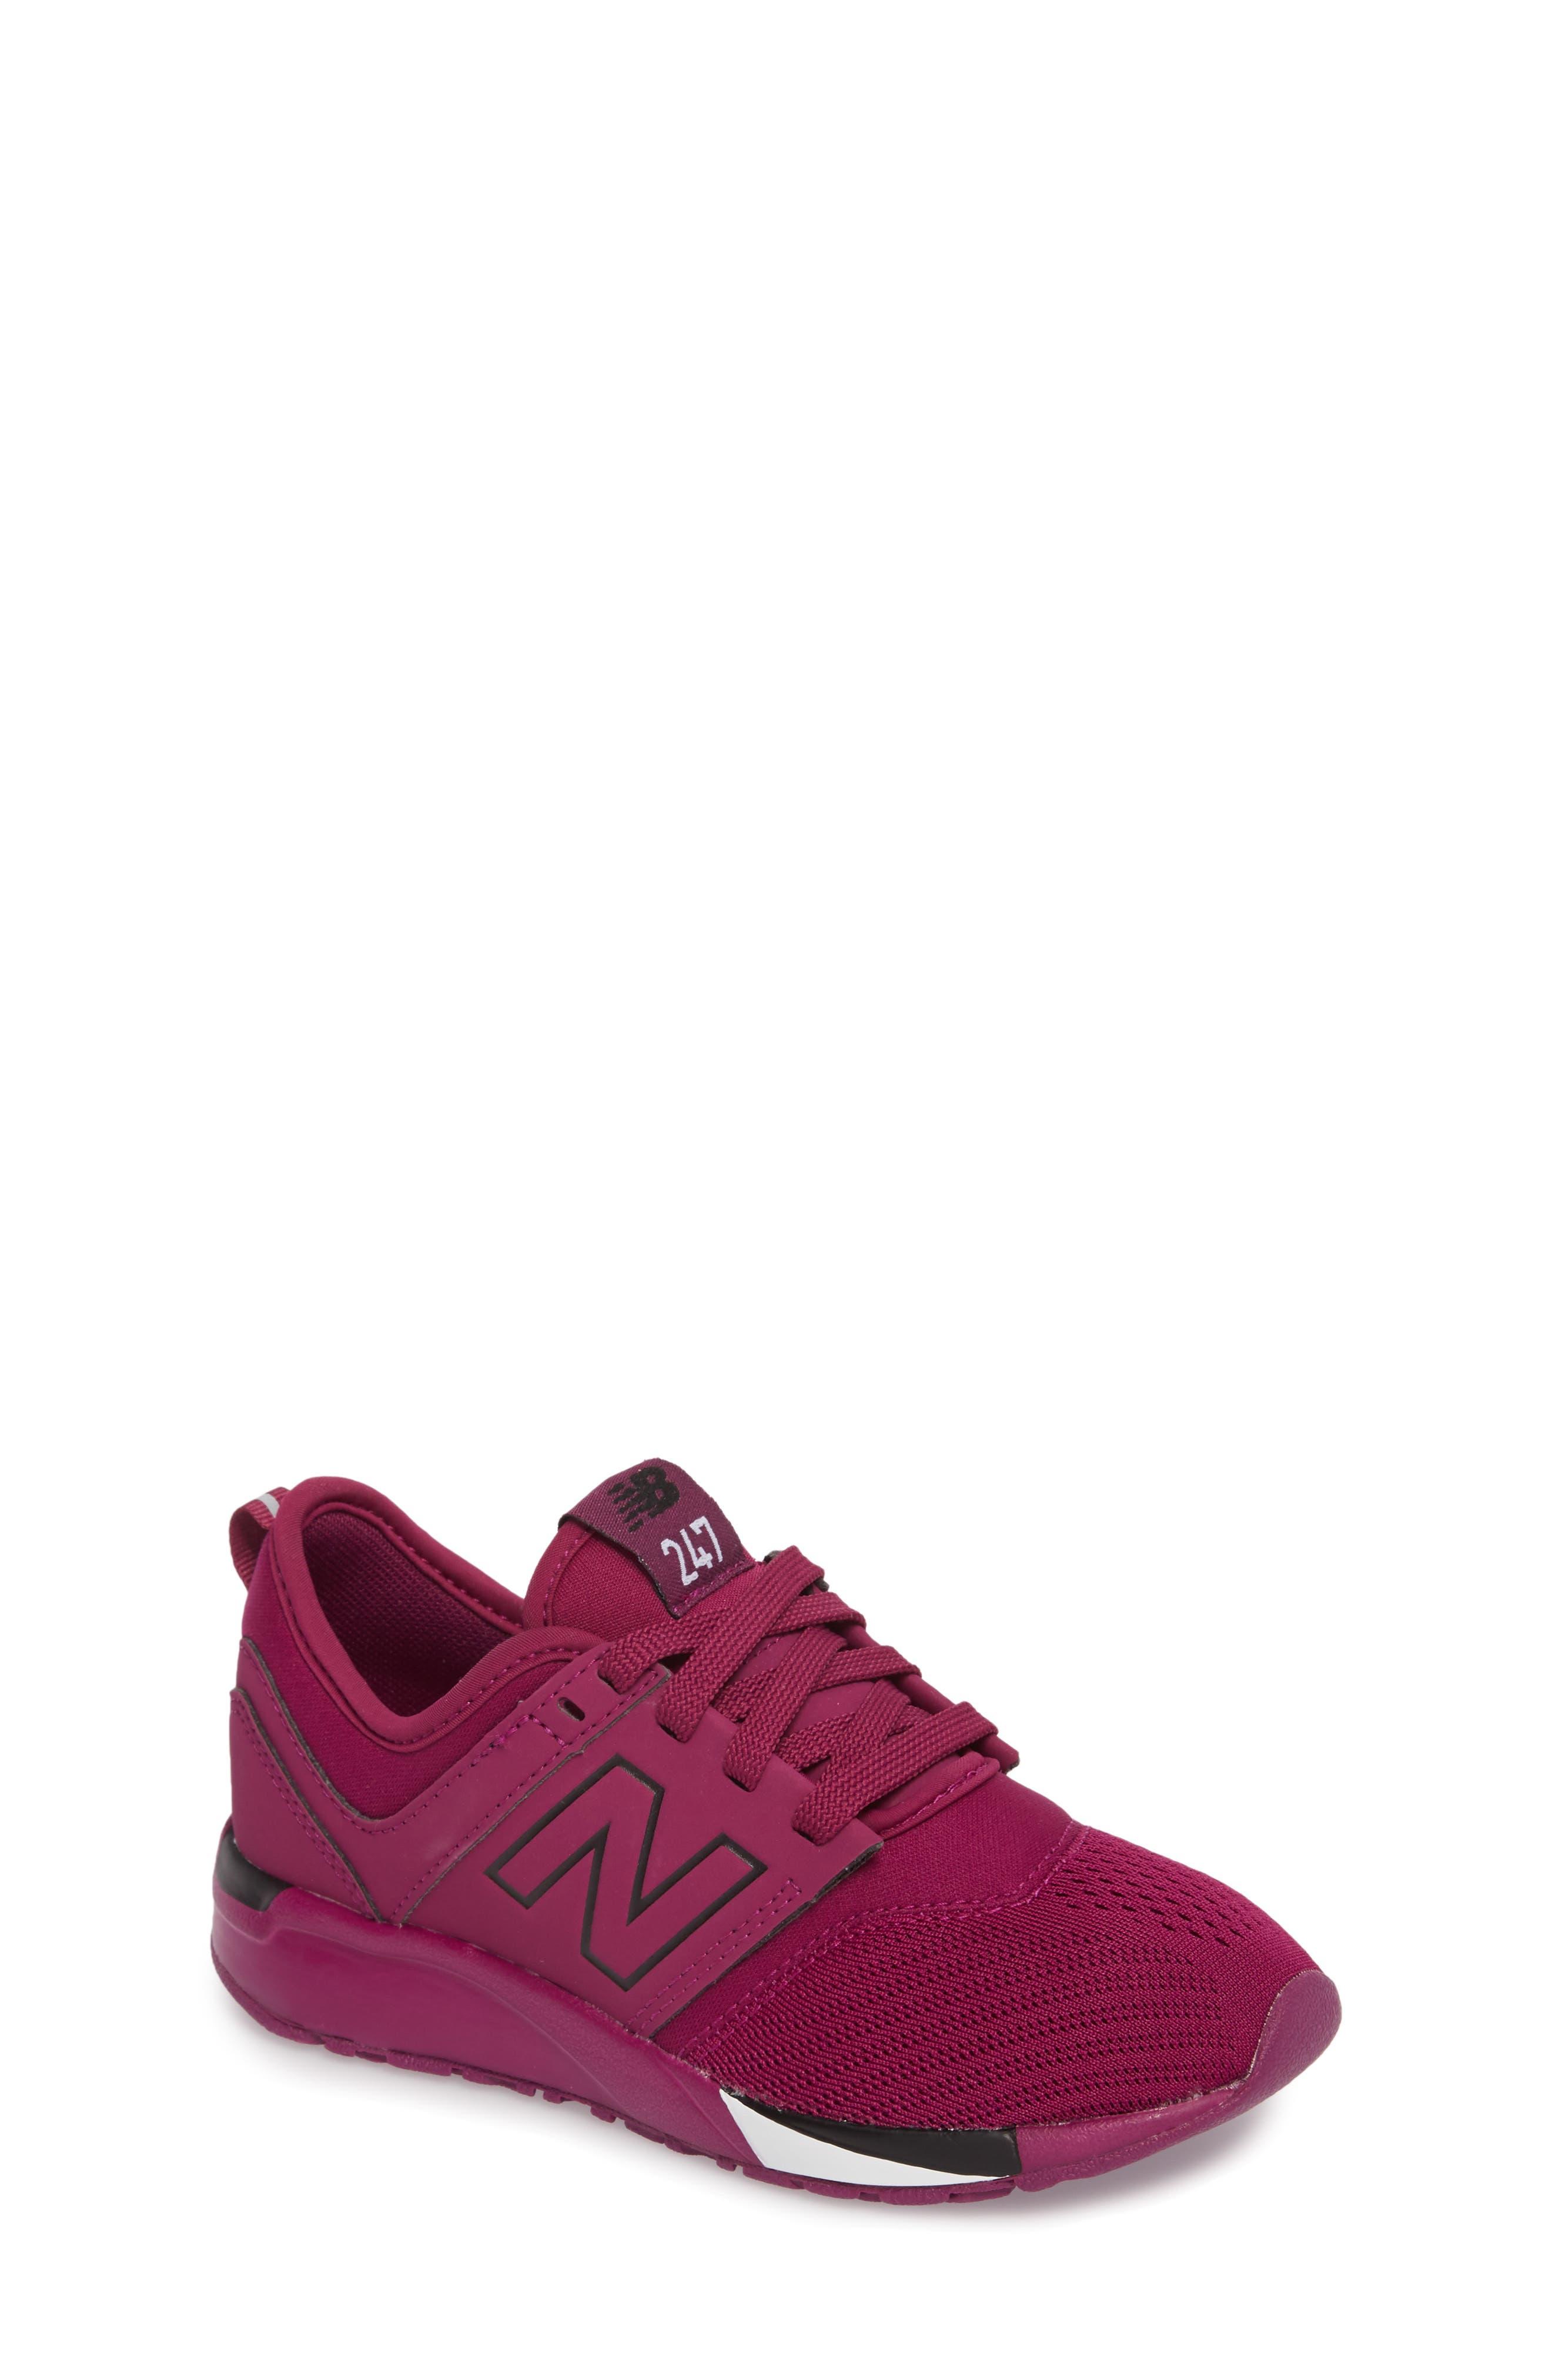 247 Sport Sneaker,                             Main thumbnail 1, color,                             Red/ Black